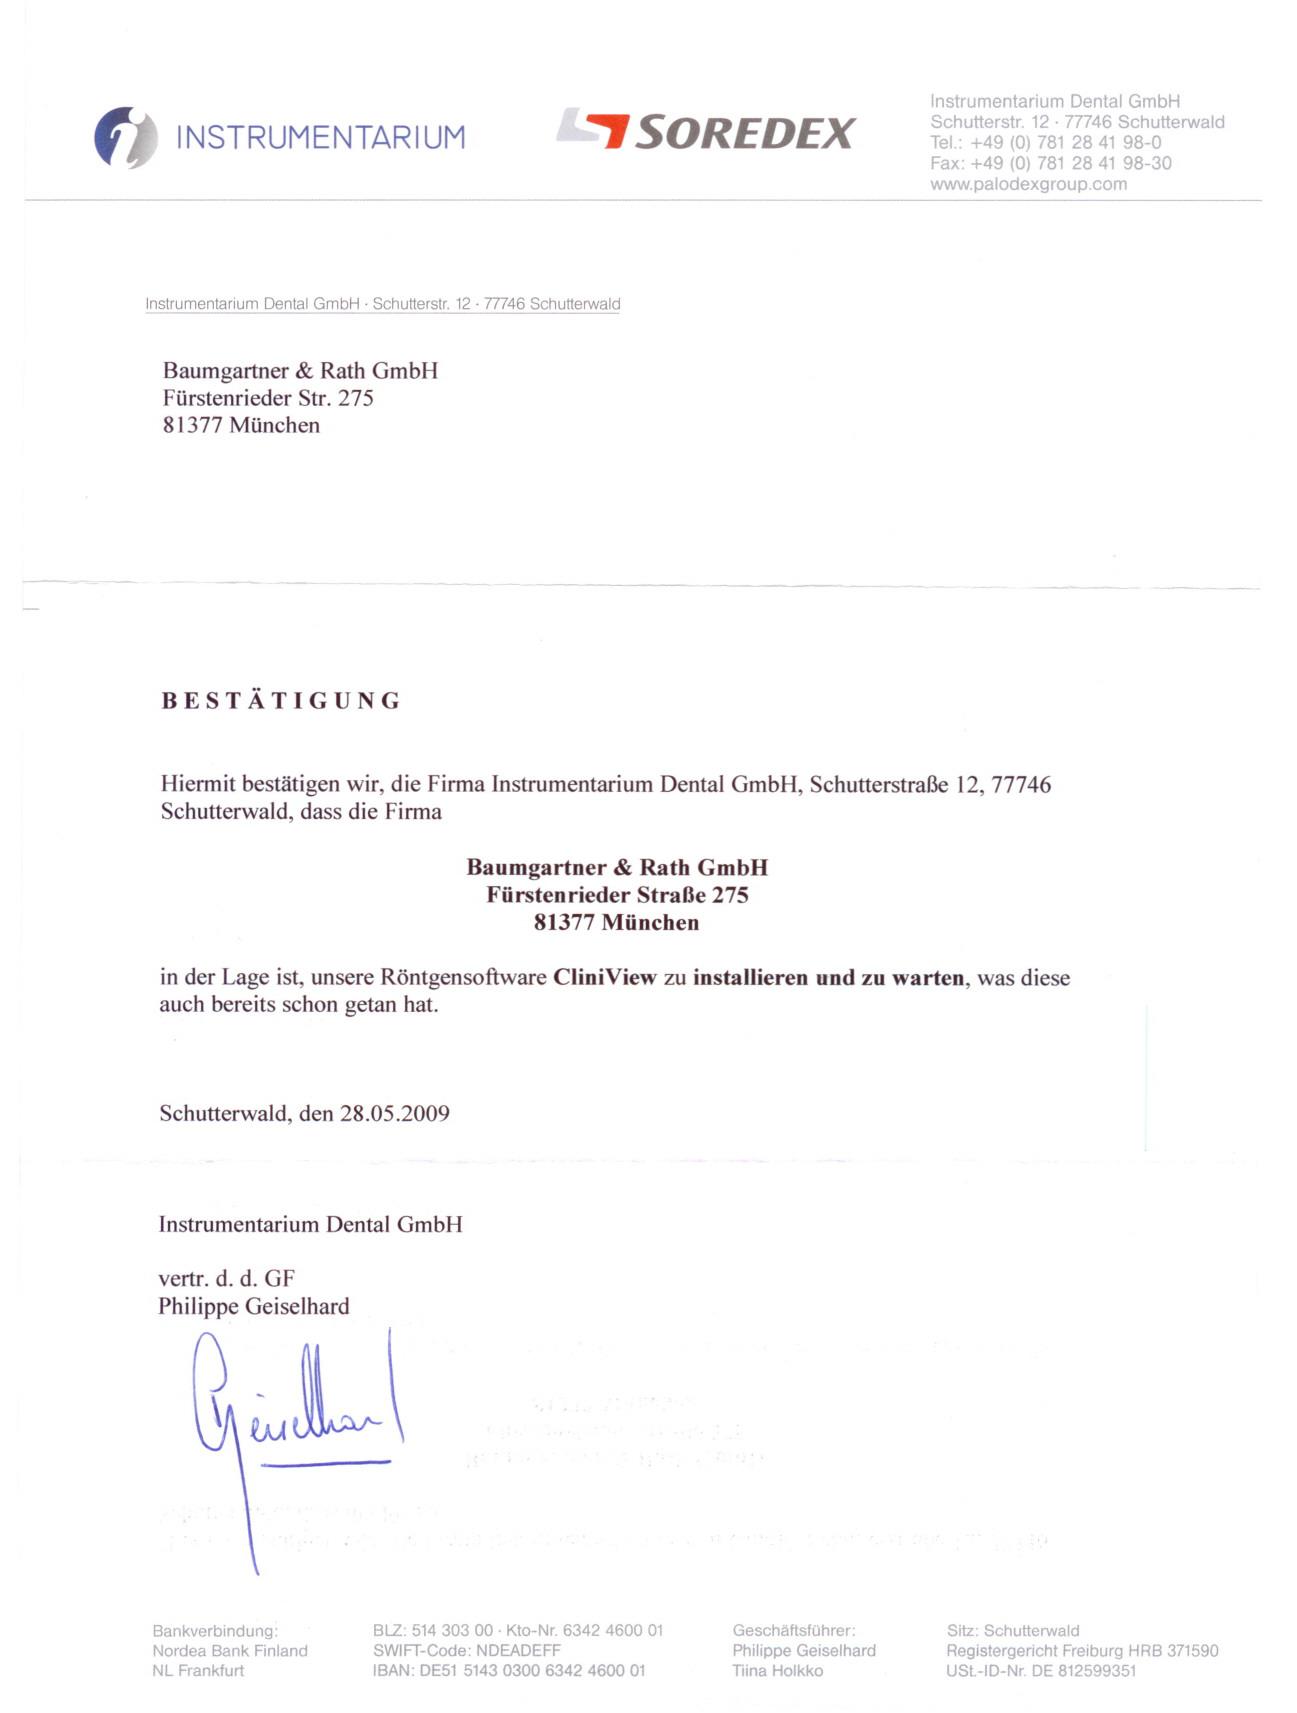 2009_05_Instrumentarium_Bestaetigung Cli